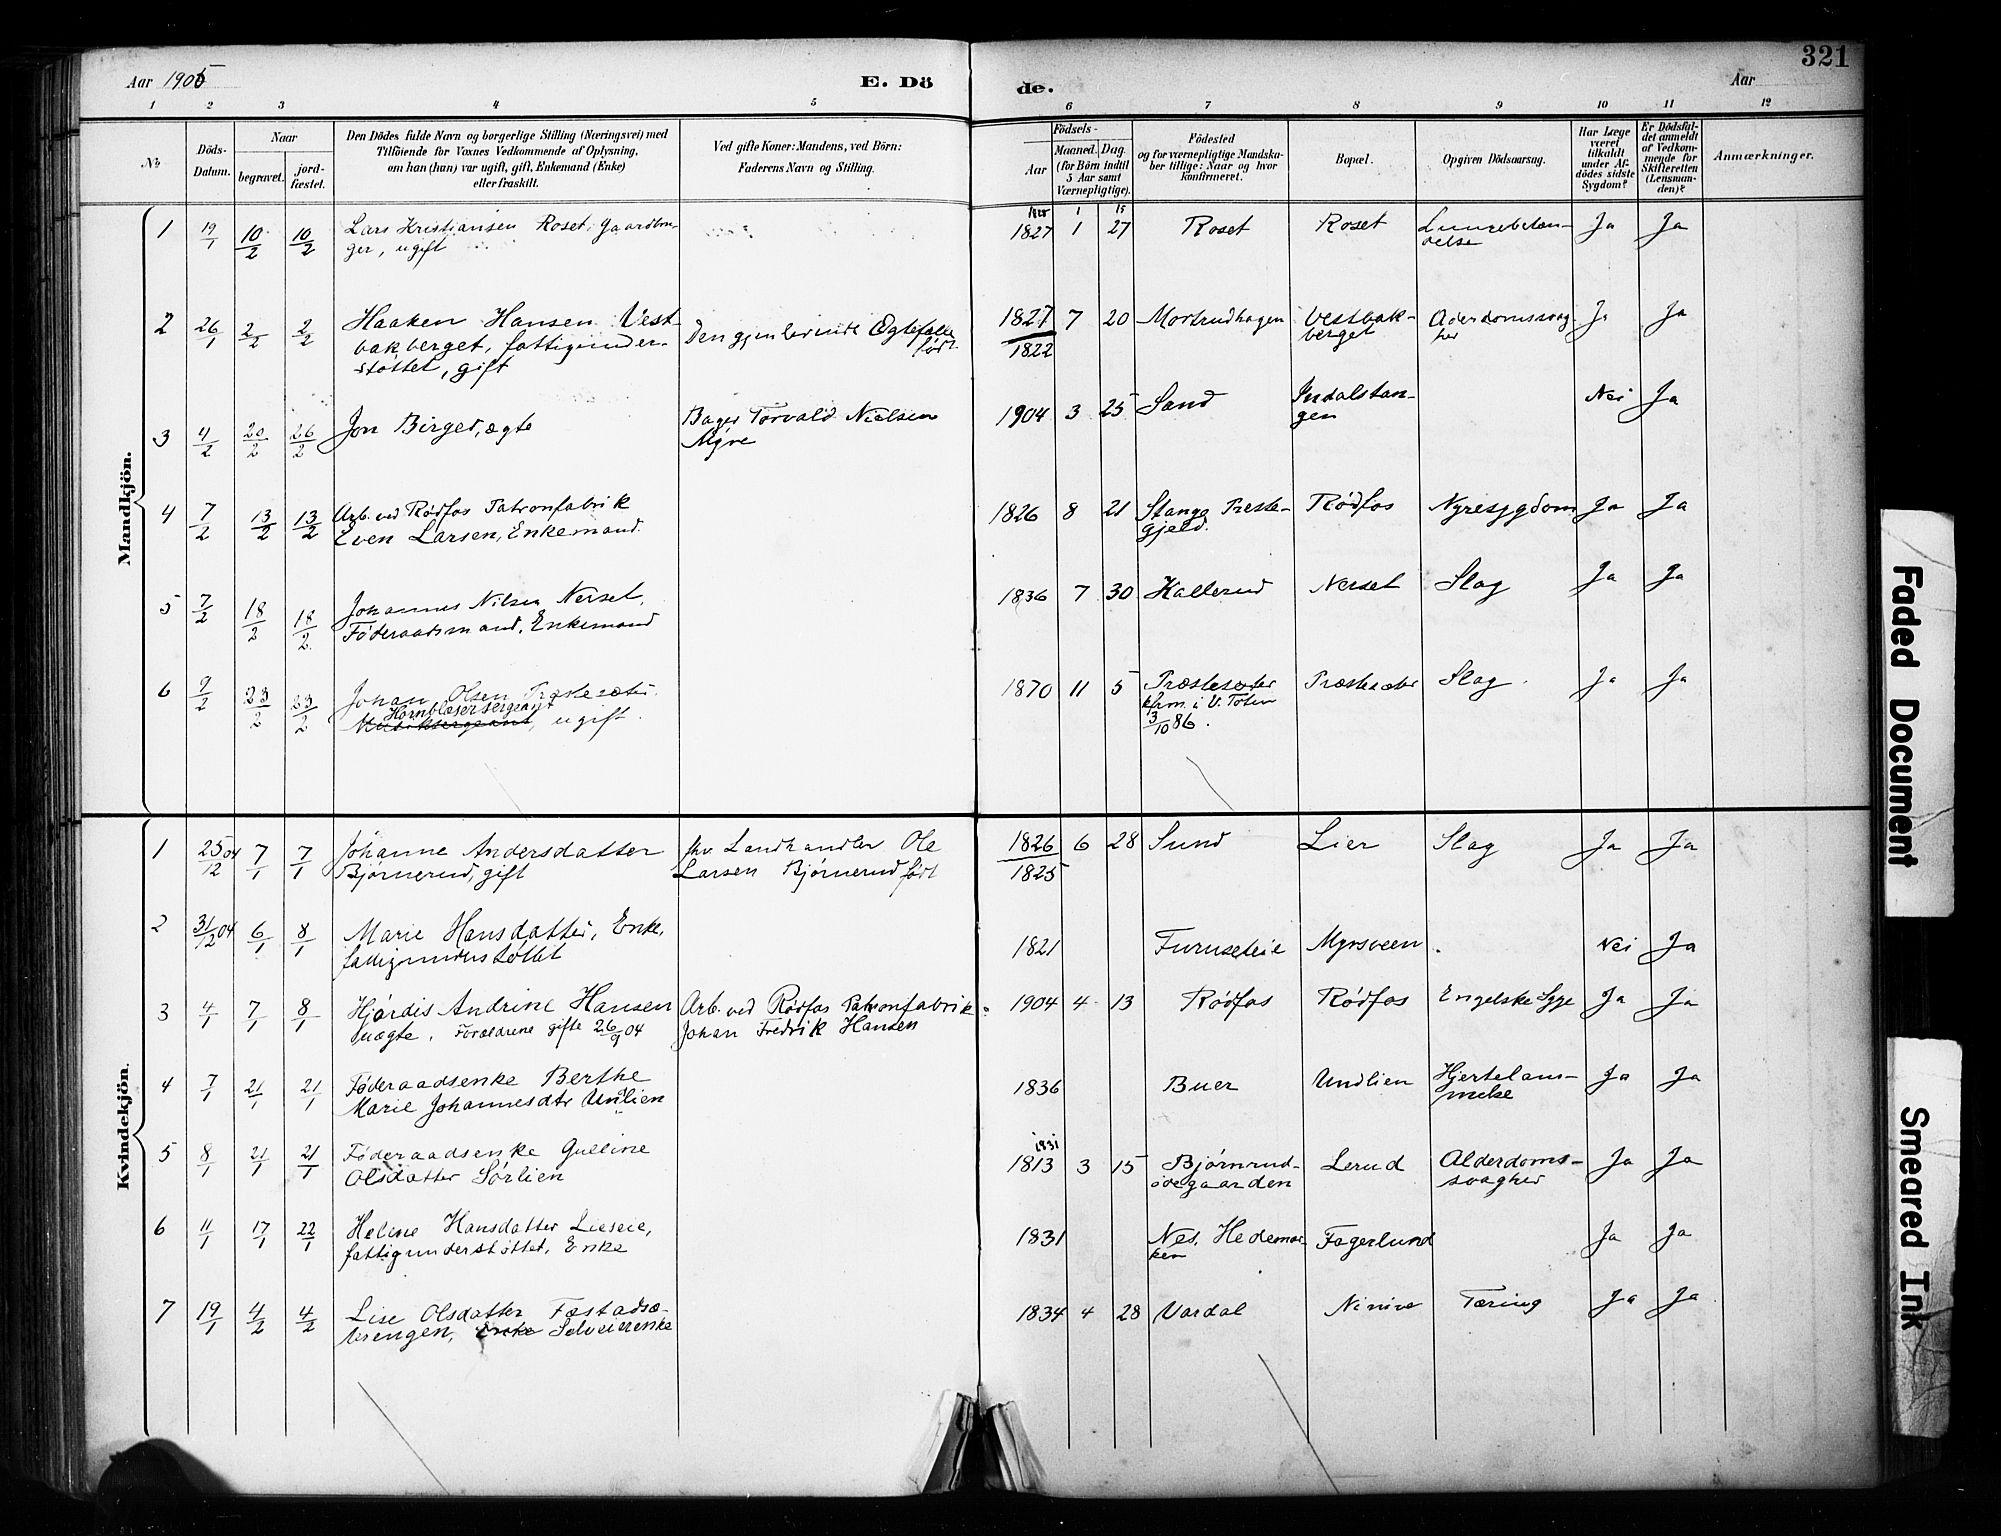 SAH, Vestre Toten prestekontor, H/Ha/Haa/L0011: Ministerialbok nr. 11, 1895-1906, s. 321